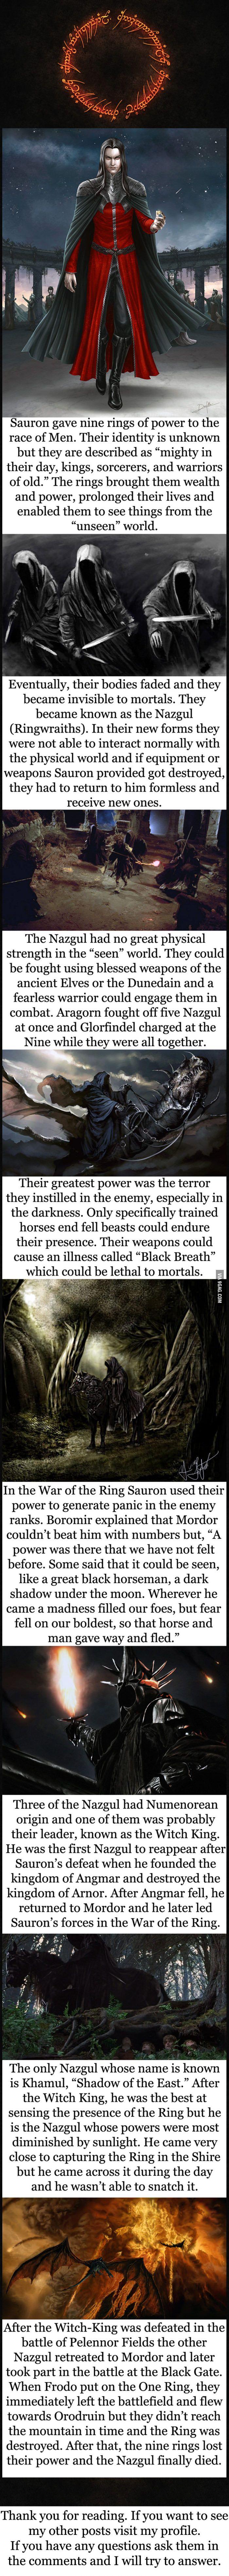 Tolkien lore - The Nazgul